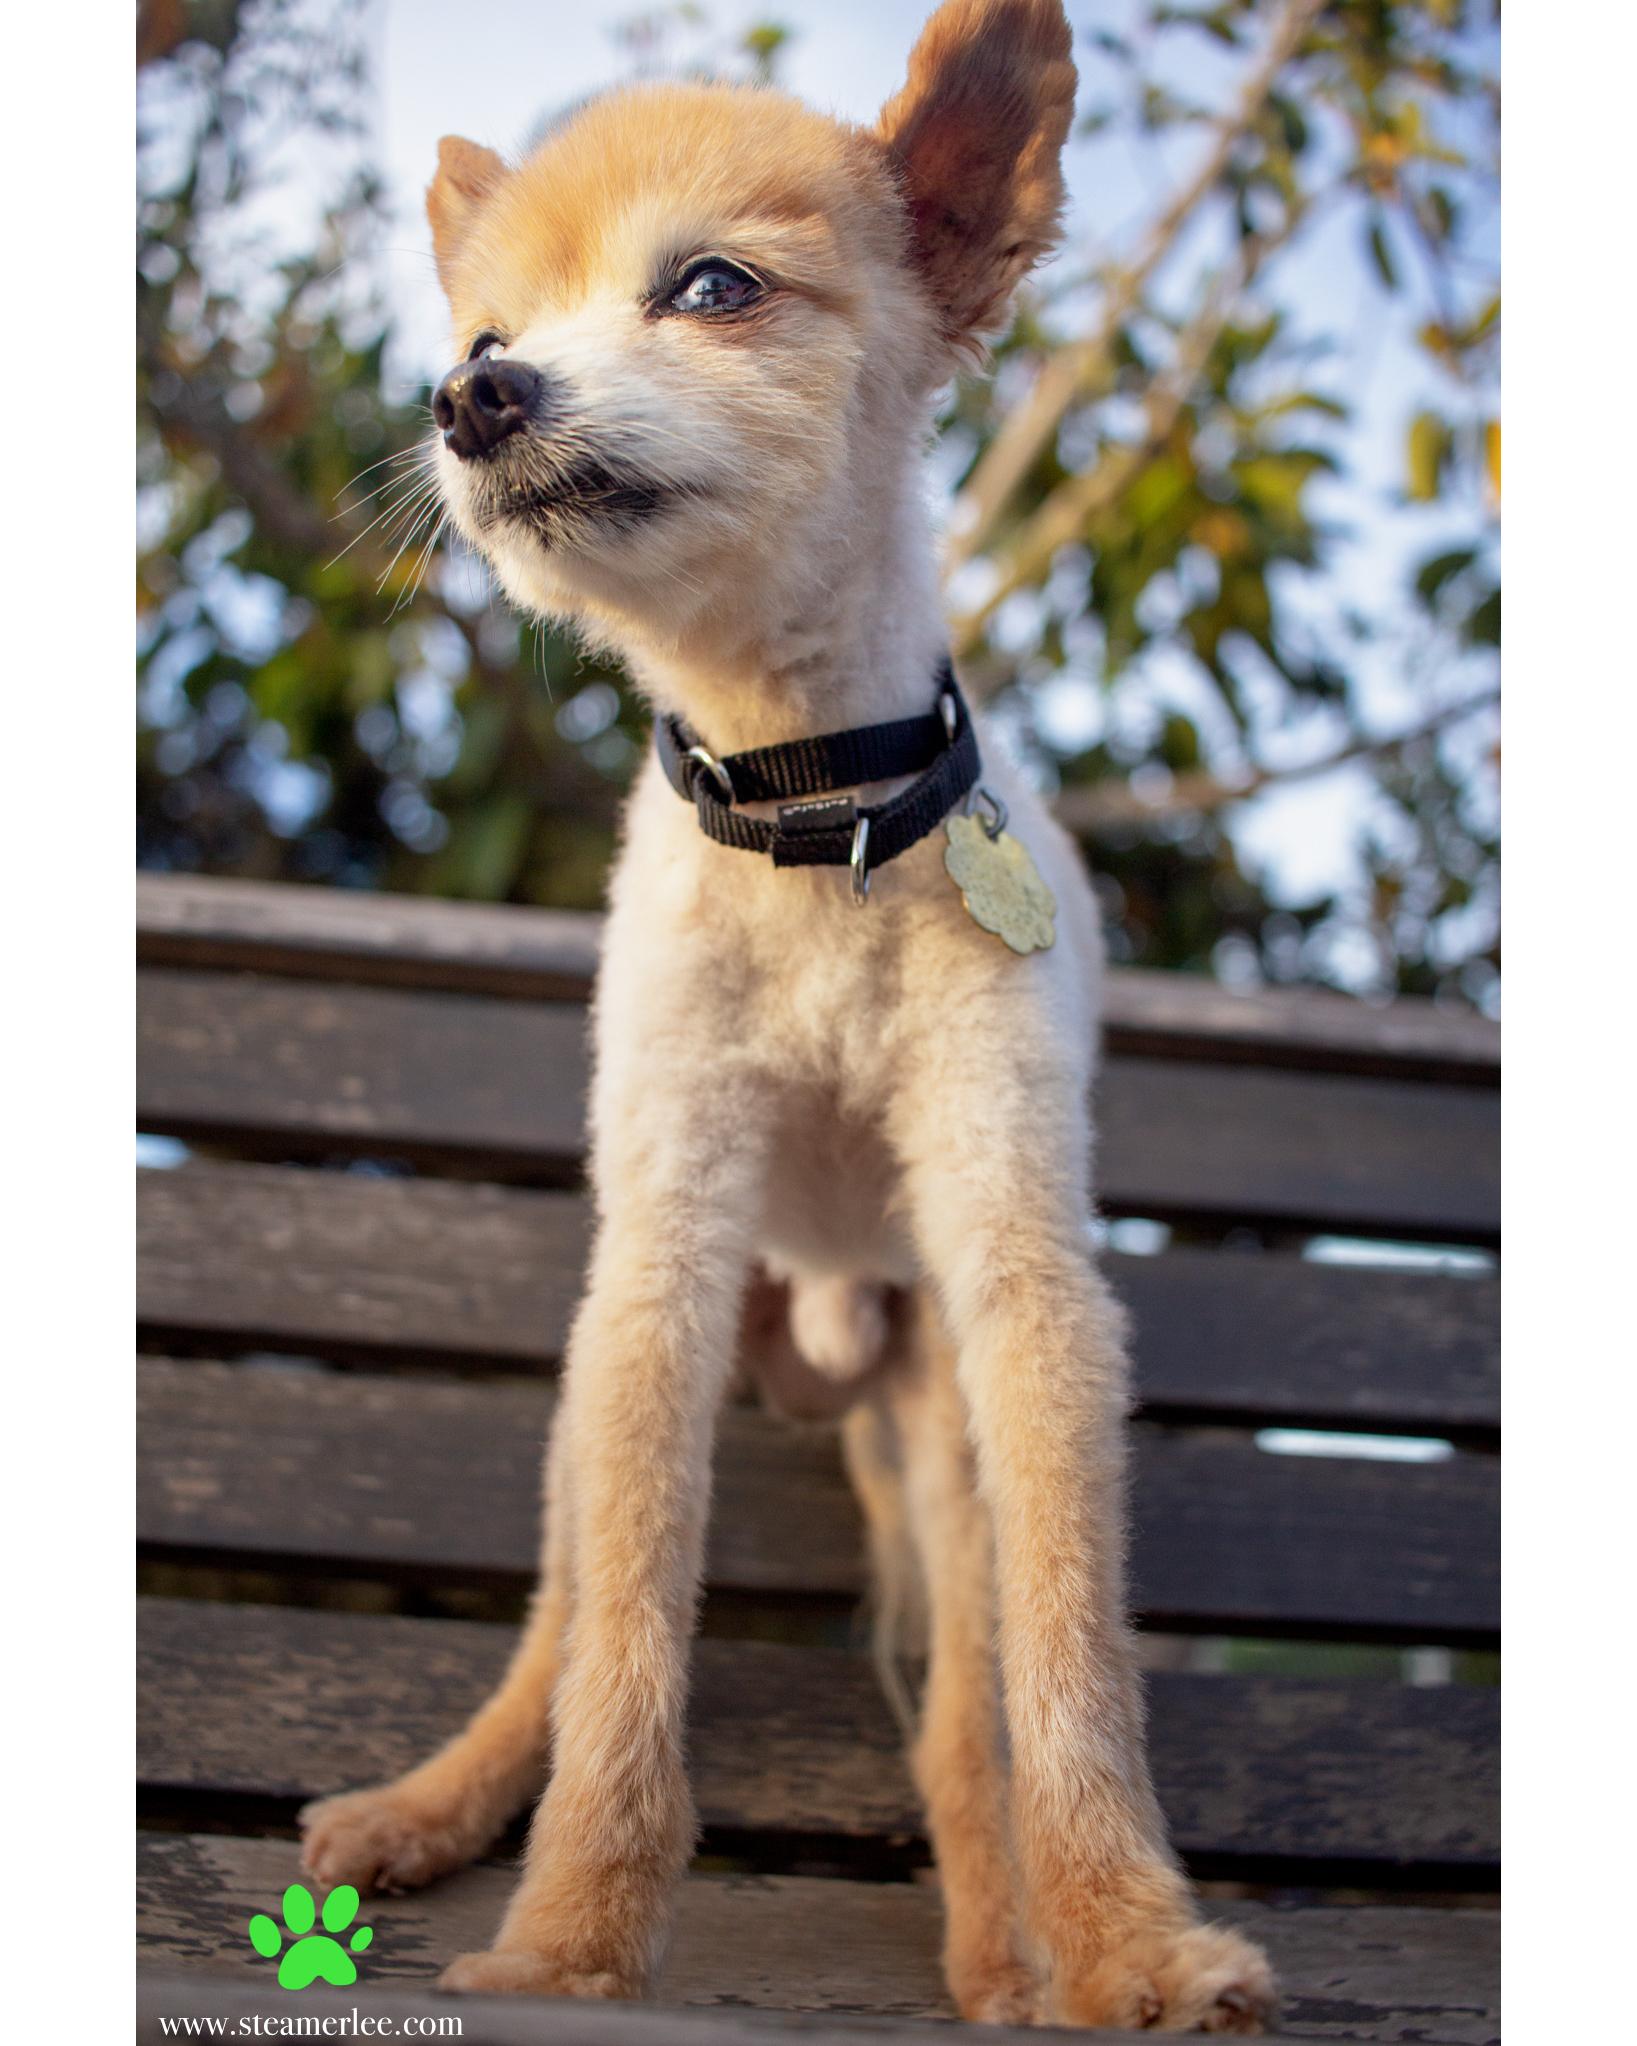 329-Orange-County-Dog-Photography-Steamer-Lee-Southern-California-SBACC.JPG